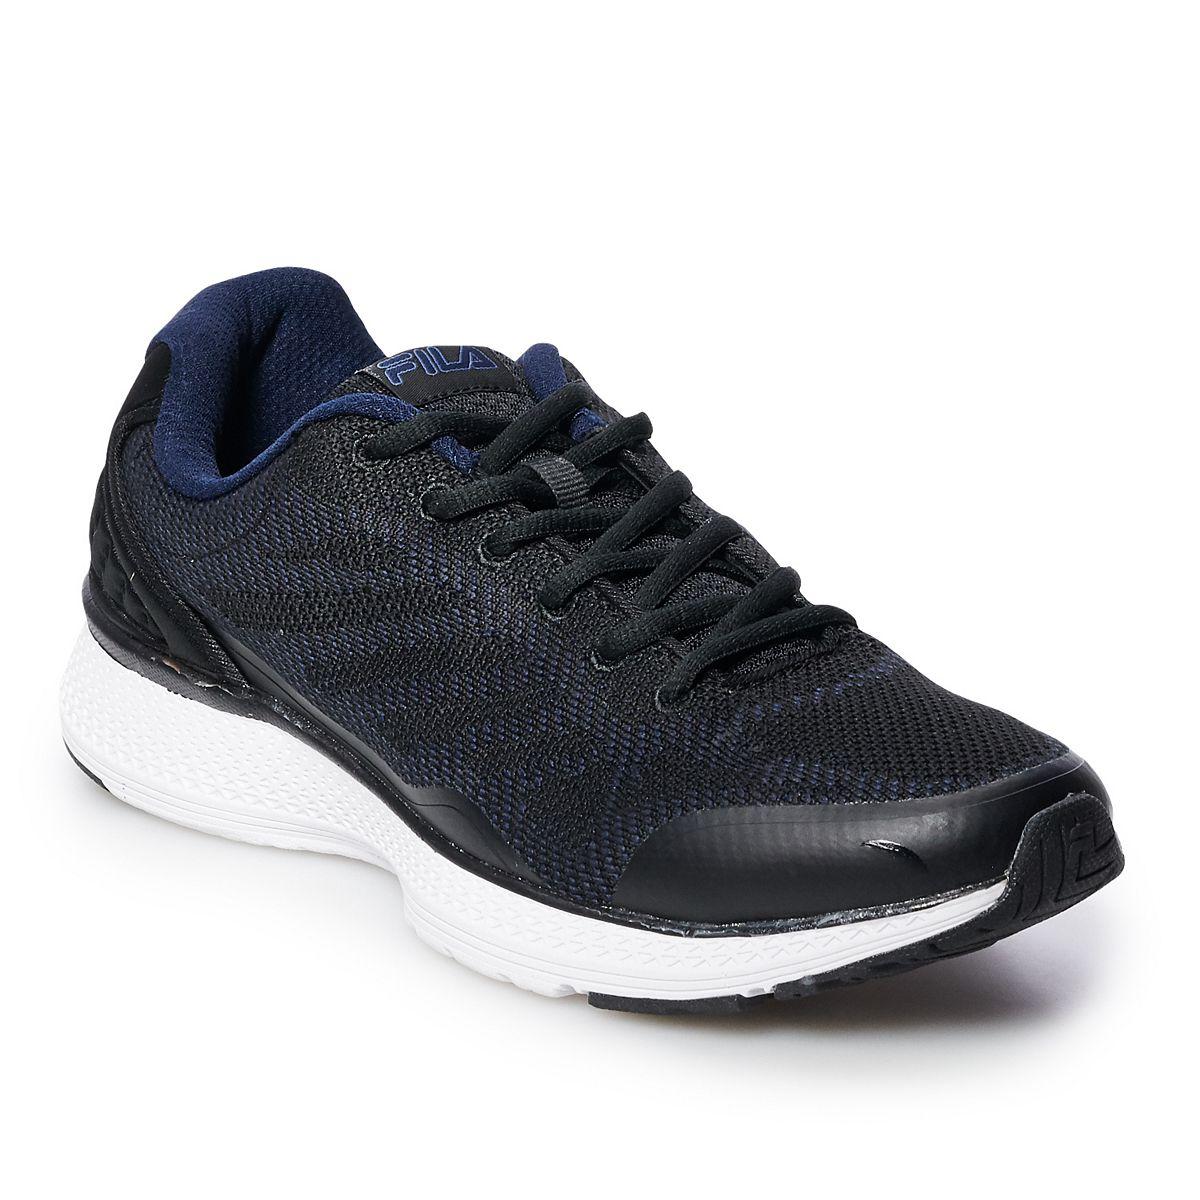 Fila Men's Memory Startup or Vernato 5 Shoes $16 + free store pickup at Kohls